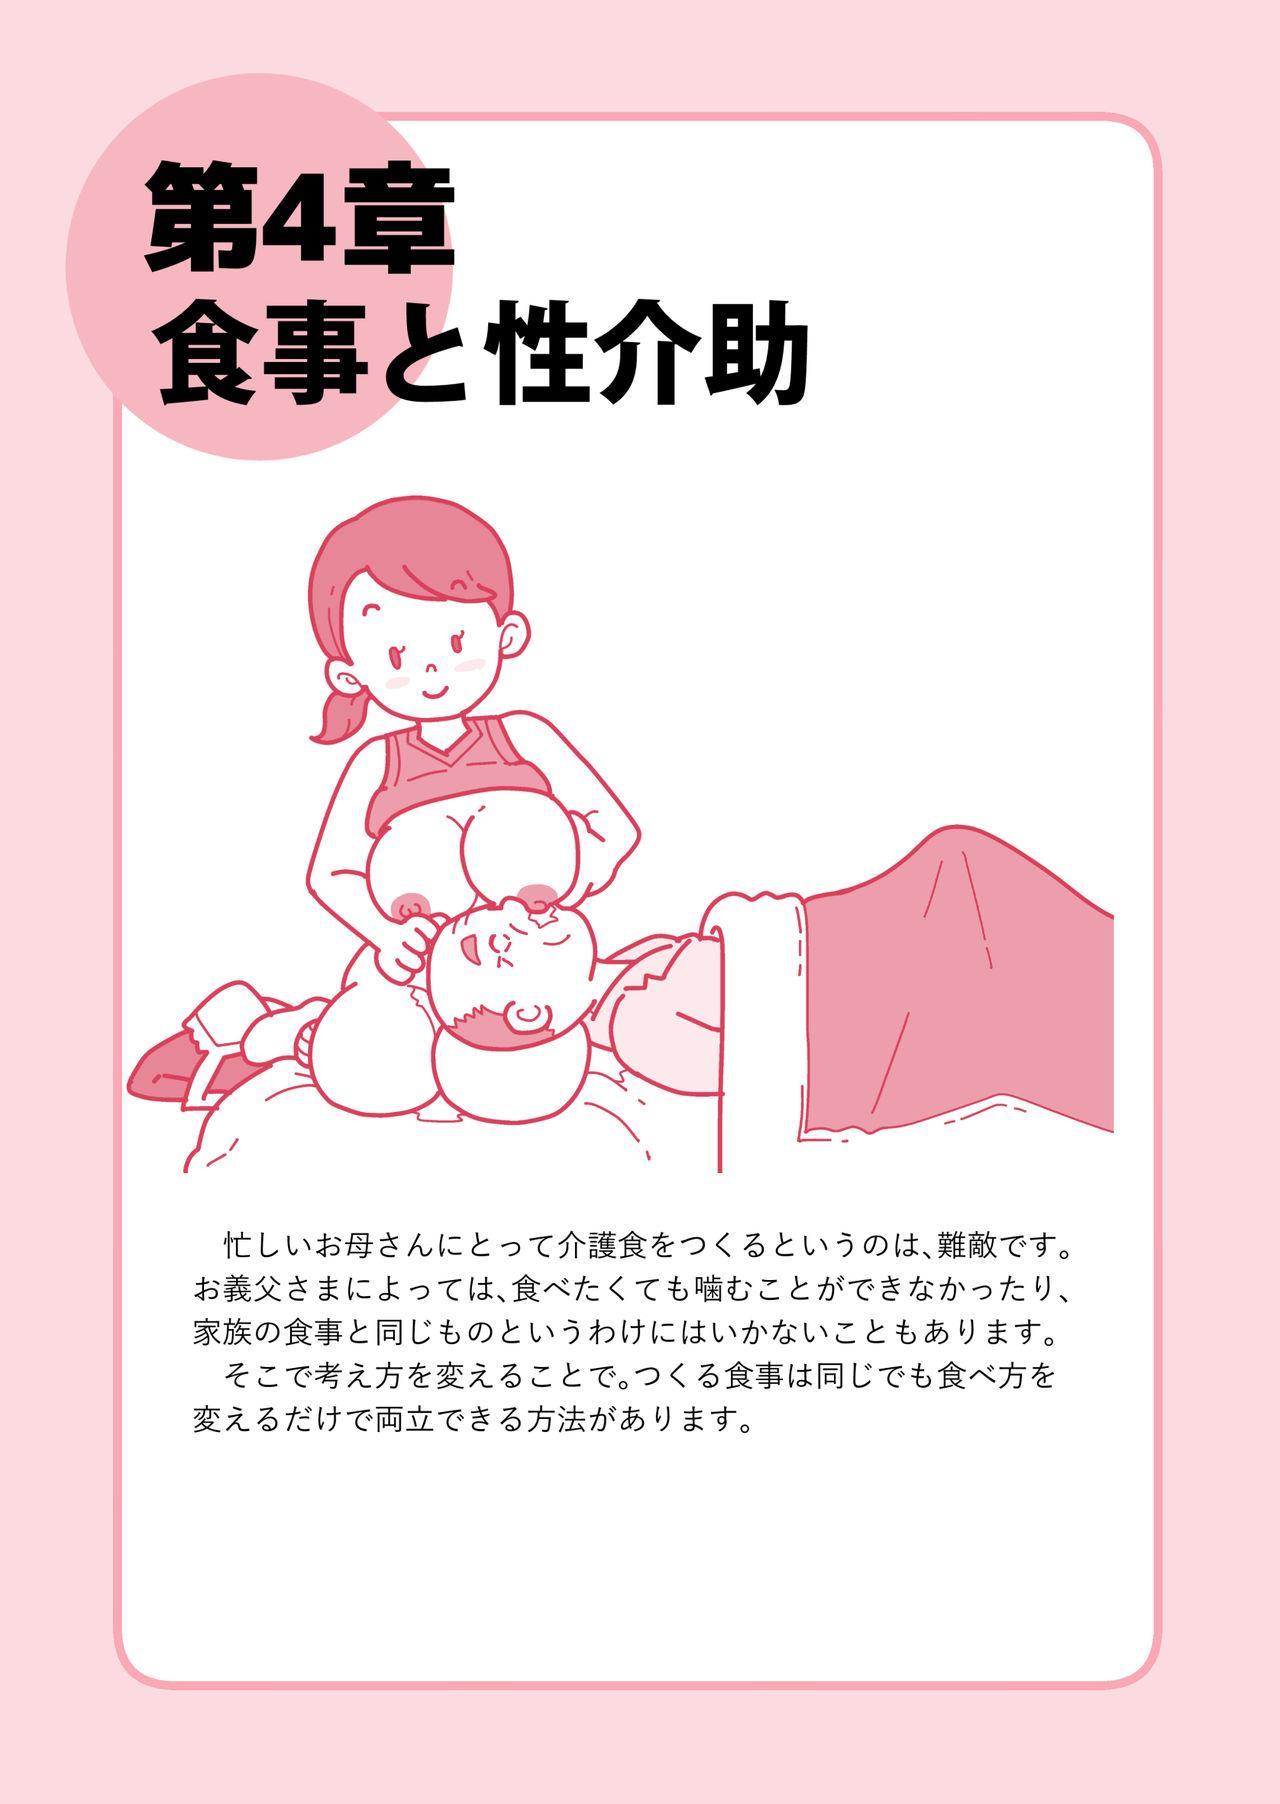 Isogasii Okaasan No Tamuno Sasa Rouzin Seikaigo | Guide for Elderly Sex Health Care to Busy Mom 28